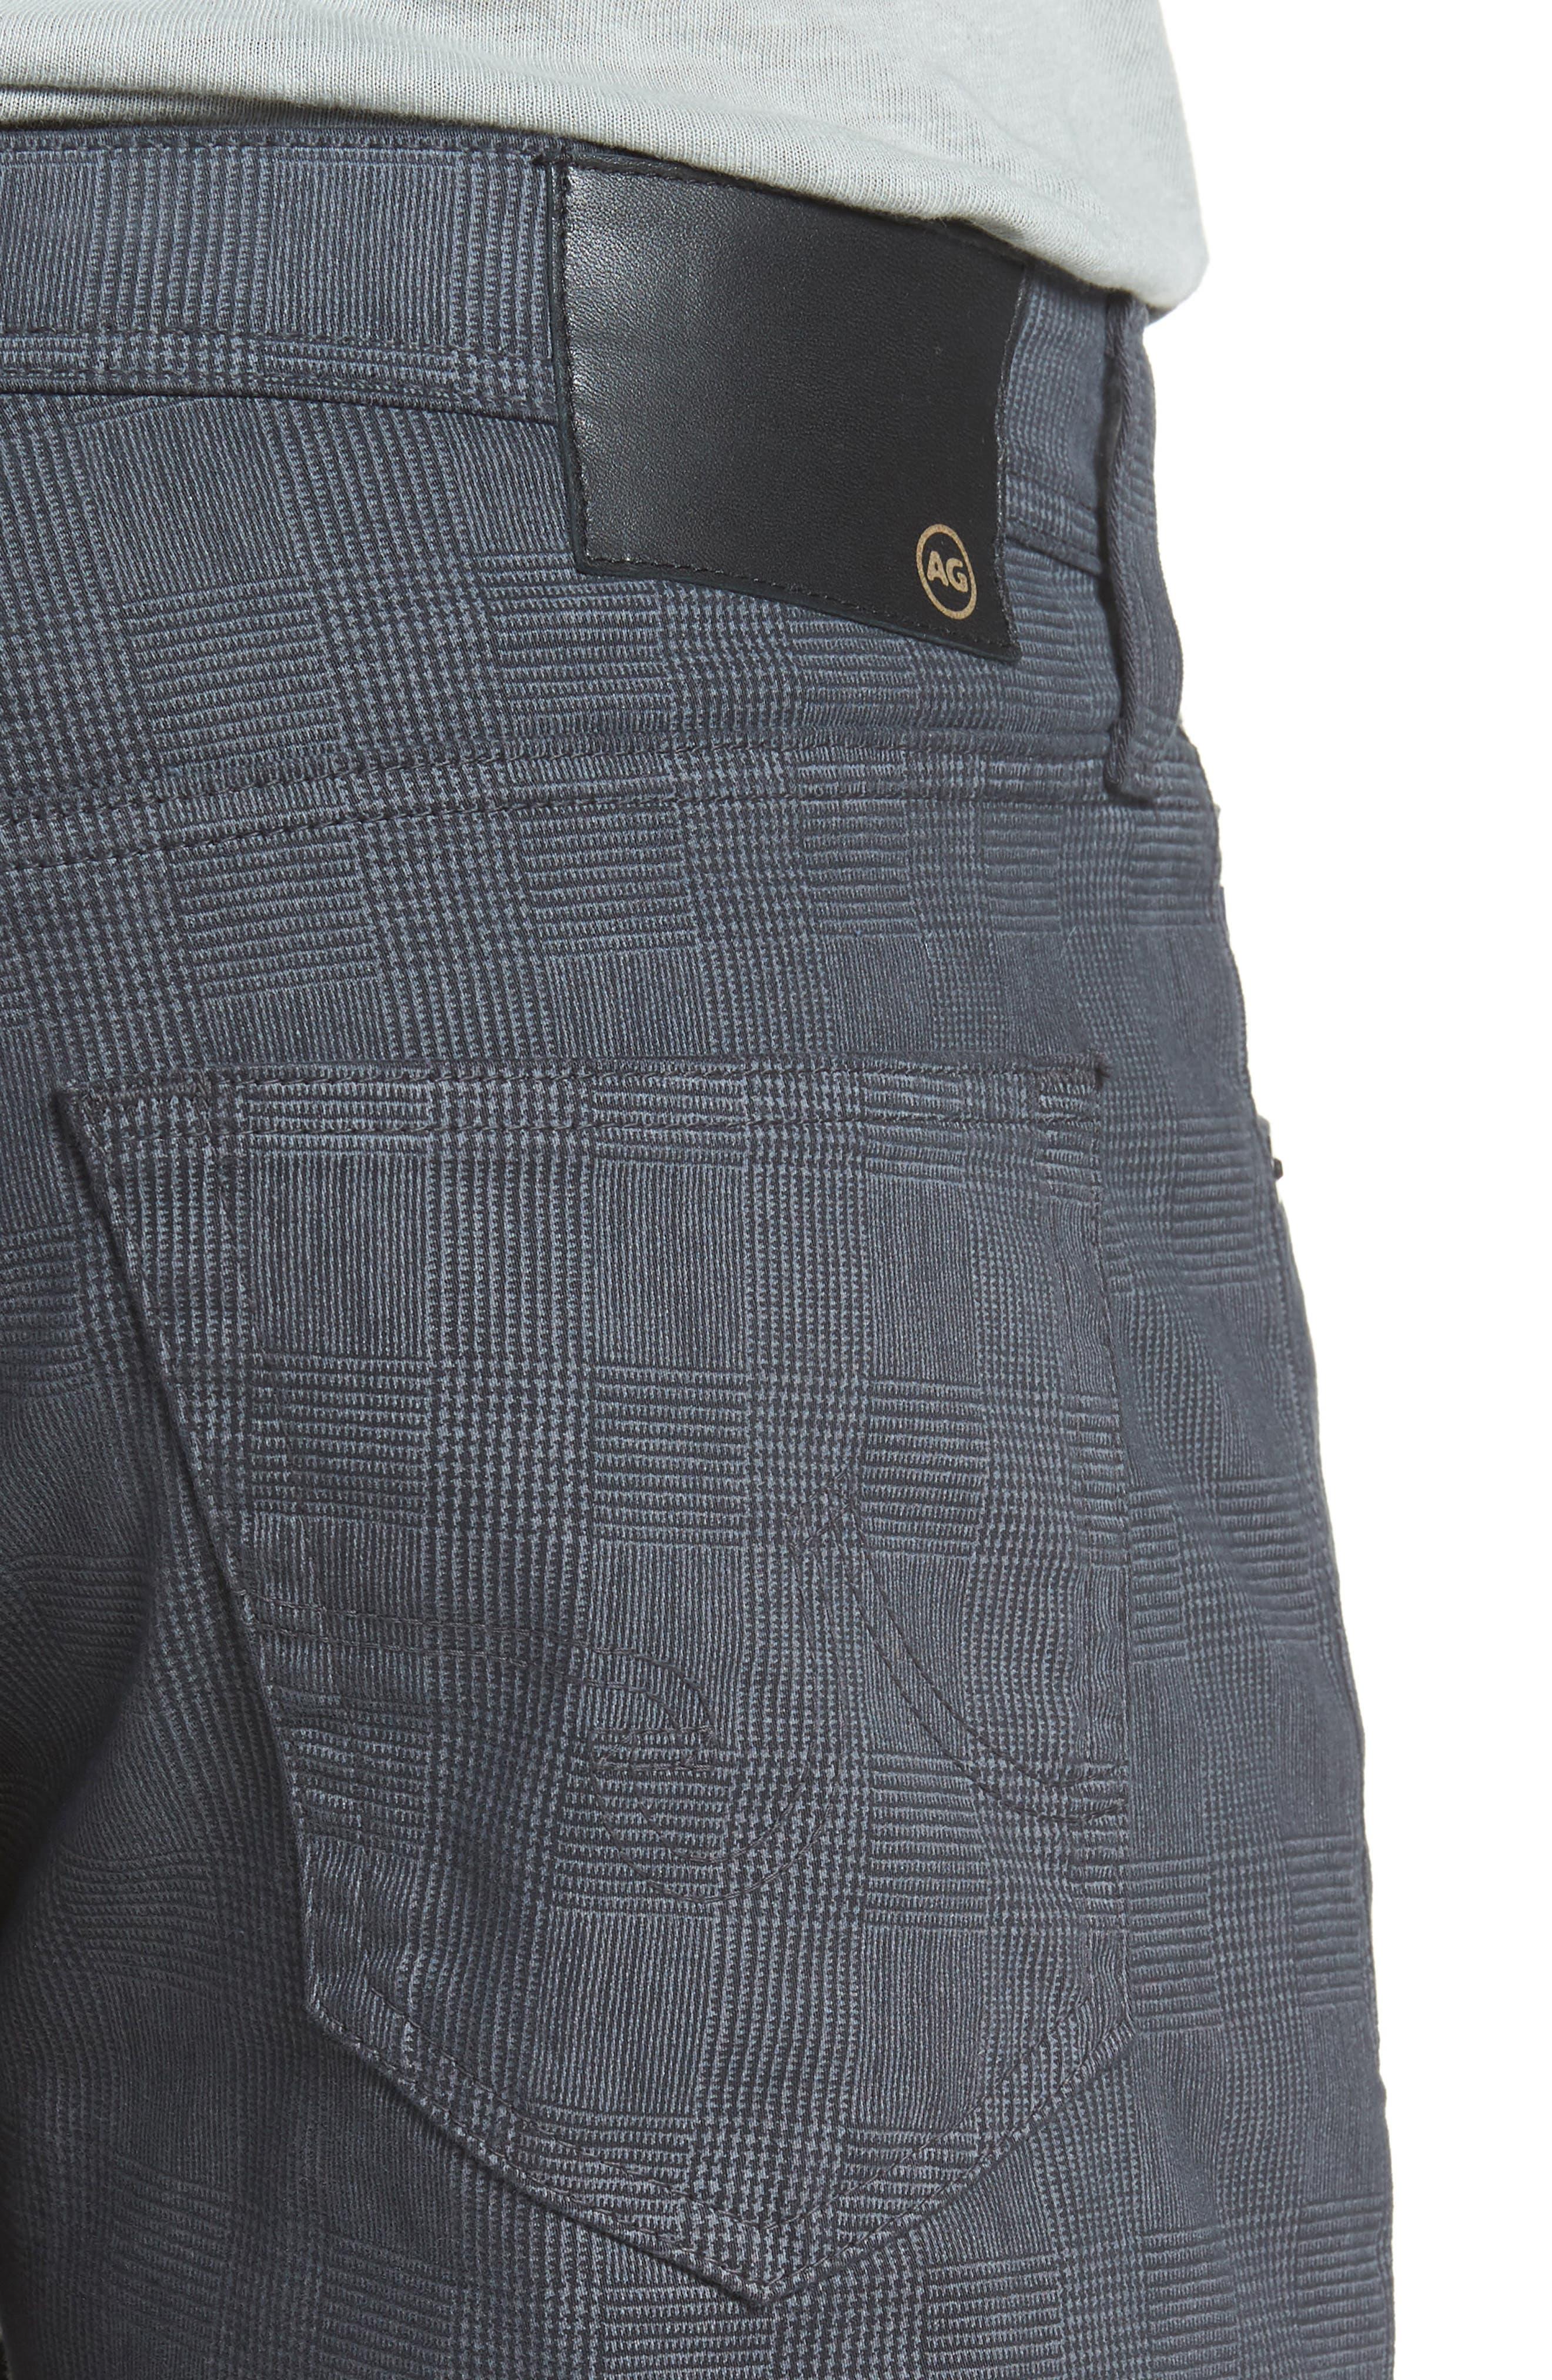 Everett SUD Print Slim Straight Leg Pants,                             Alternate thumbnail 4, color,                             FINE PLAID GREY STONE